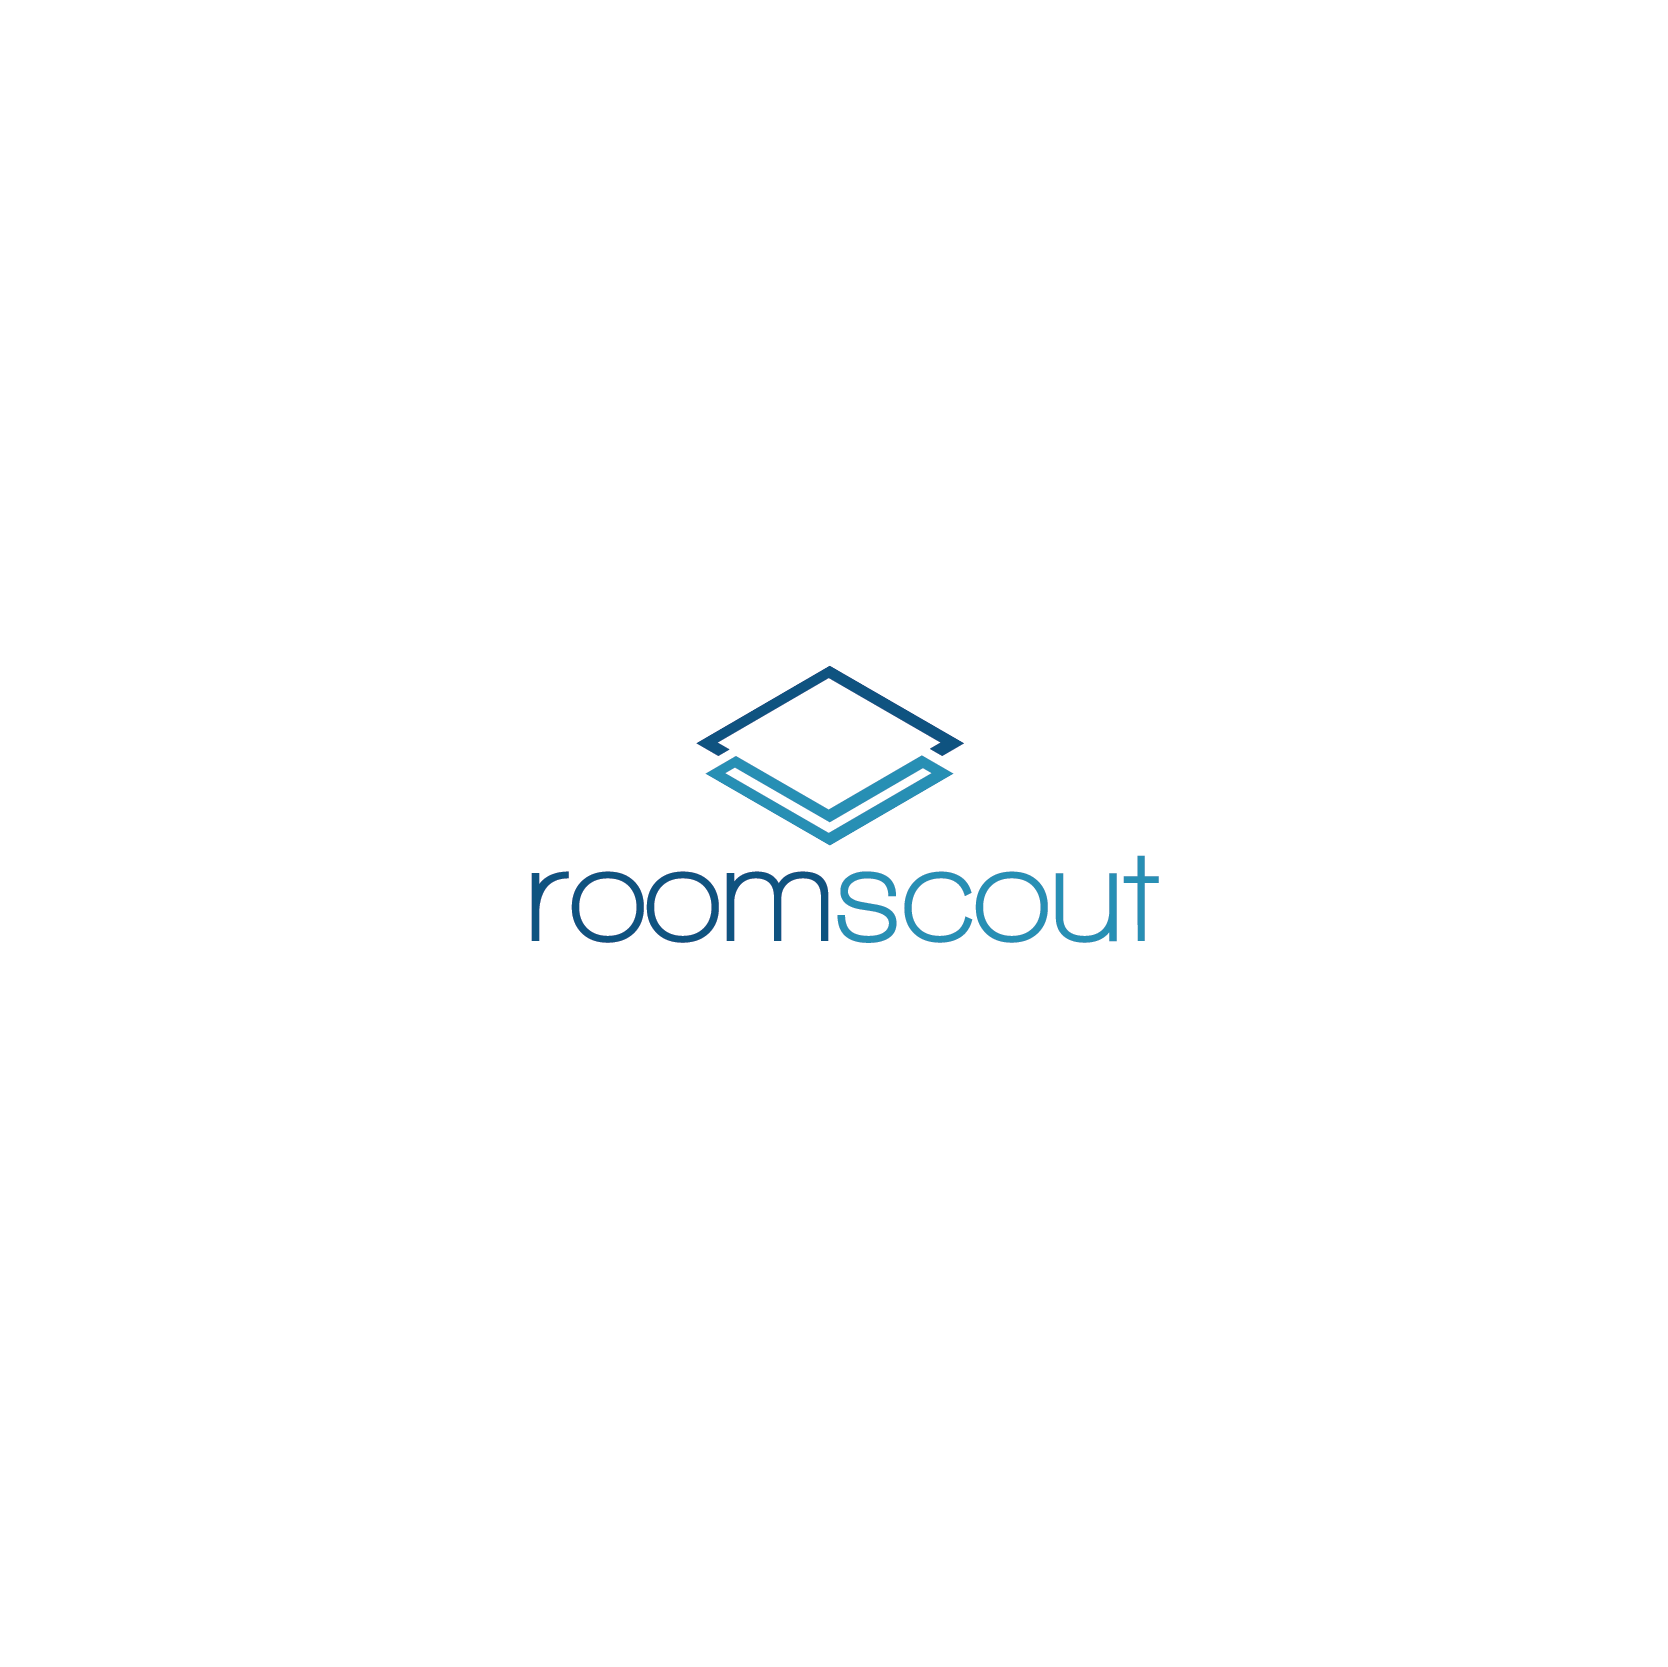 Logo & Visitenkarte für Roomscout Logo & Visitenkarte designen